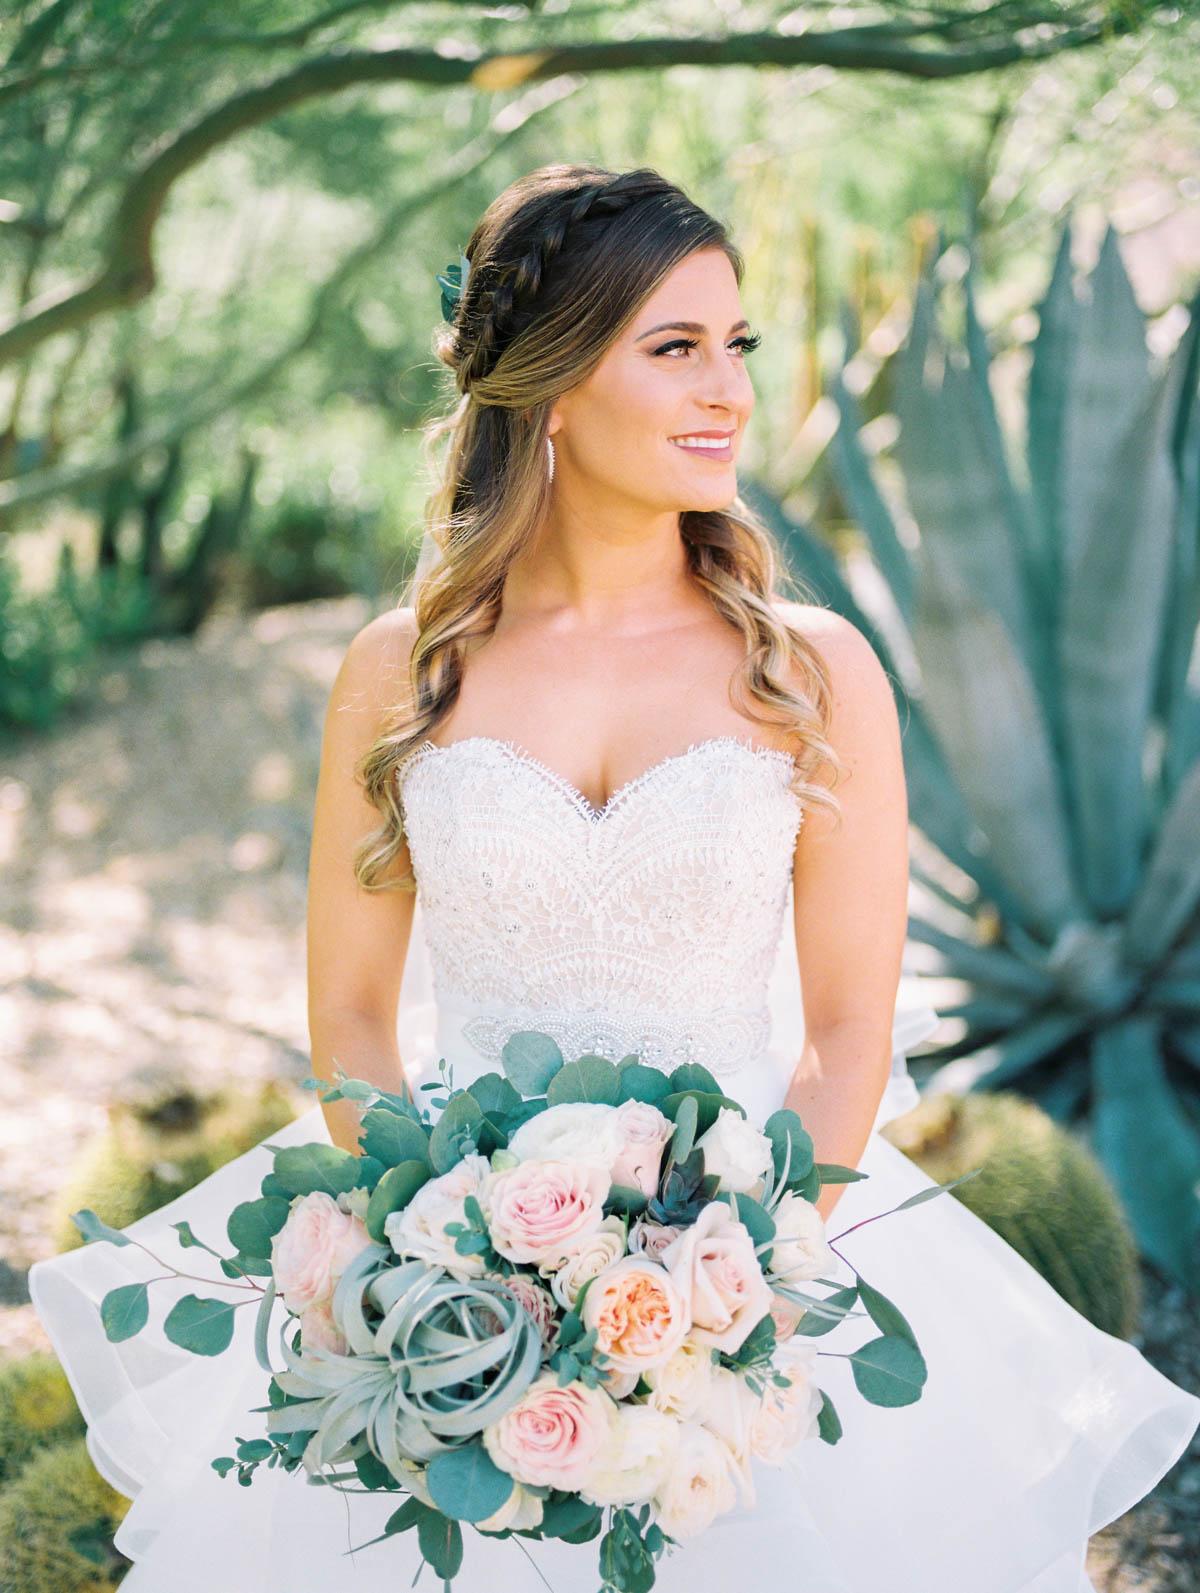 Desert bride captured by Tucson Wedding Photographers Betsy & John